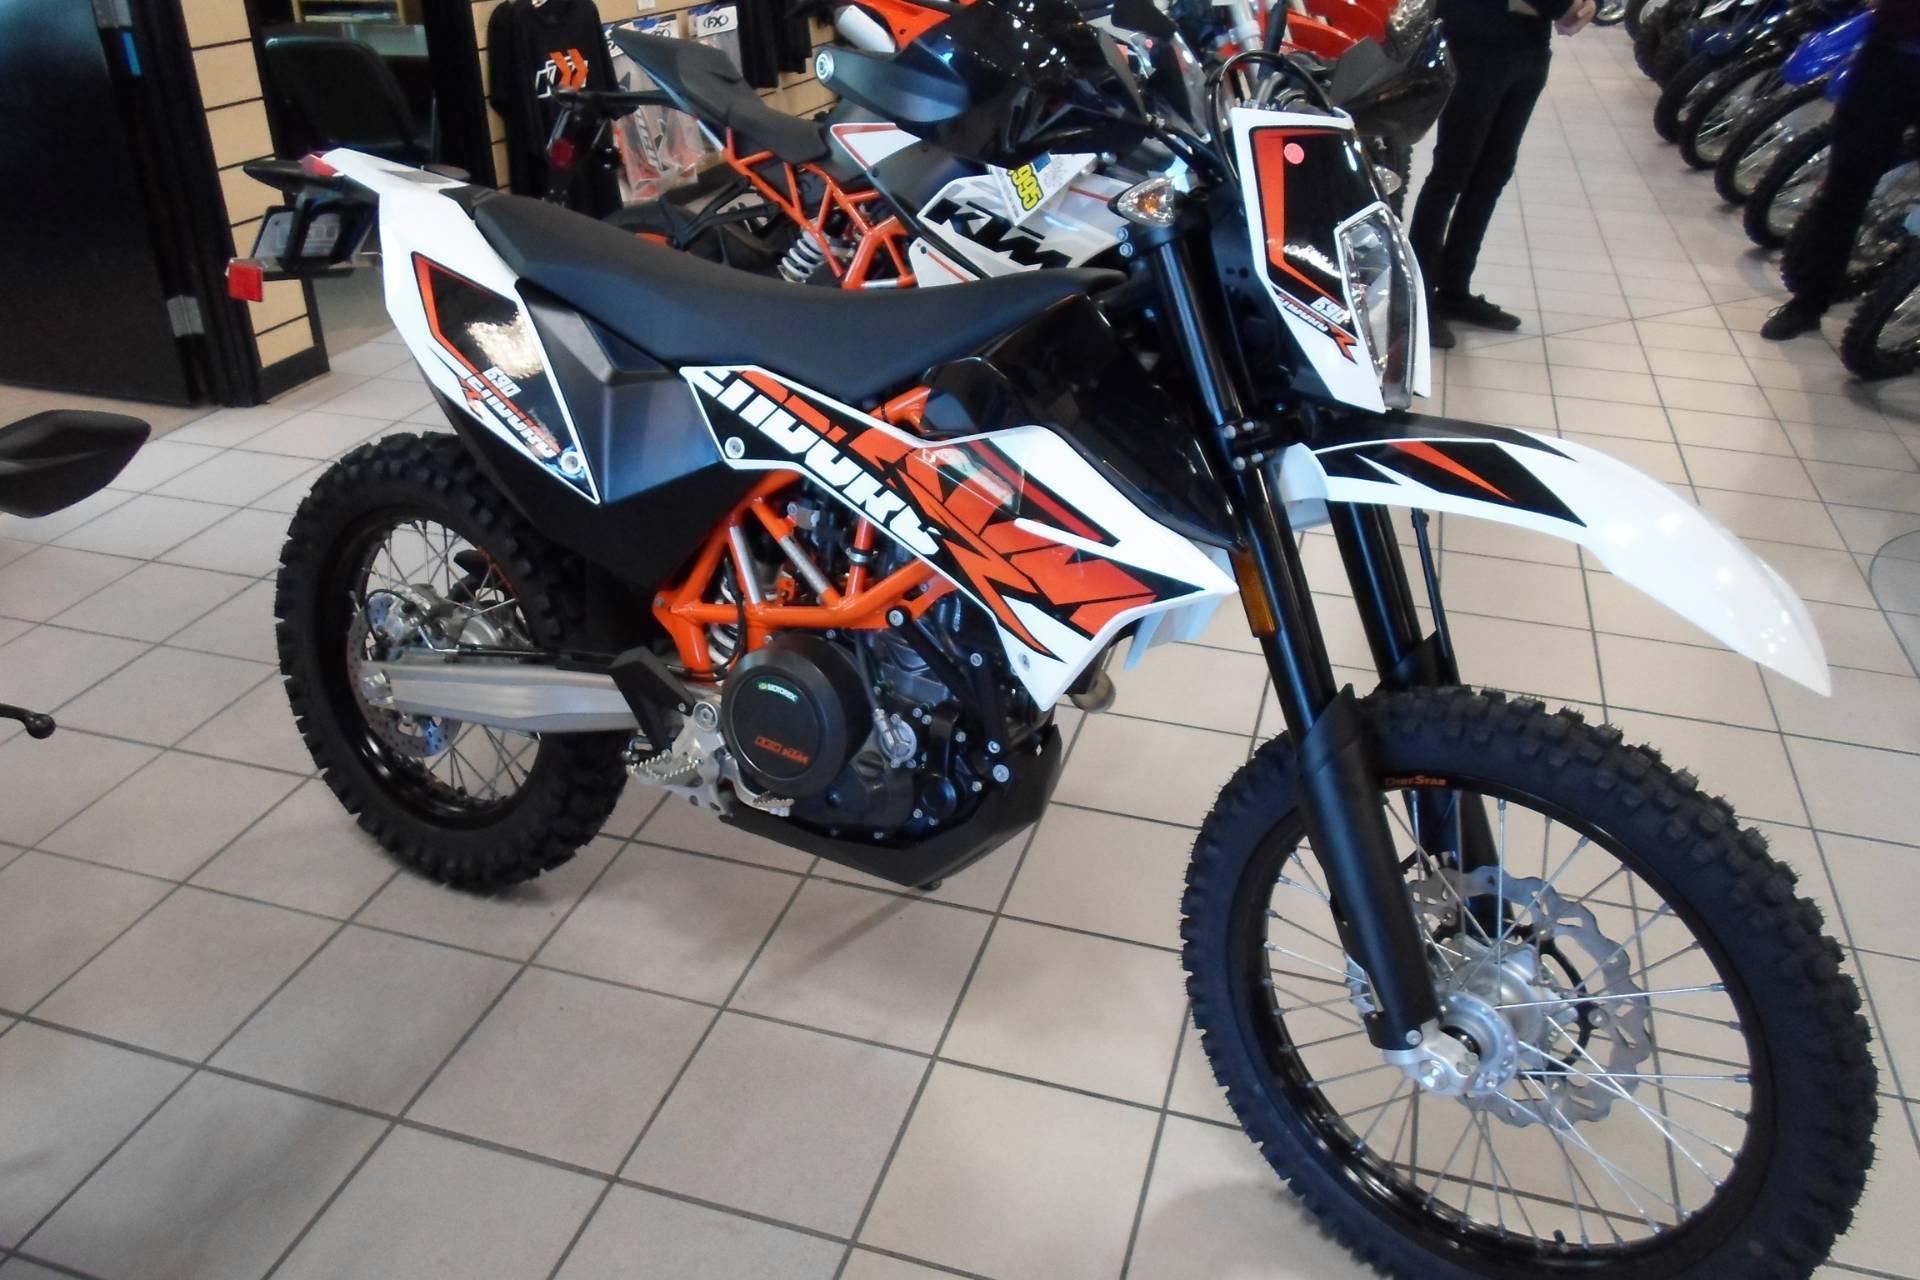 new 2017 ktm 690 enduro r motorcycles in san marcos, ca